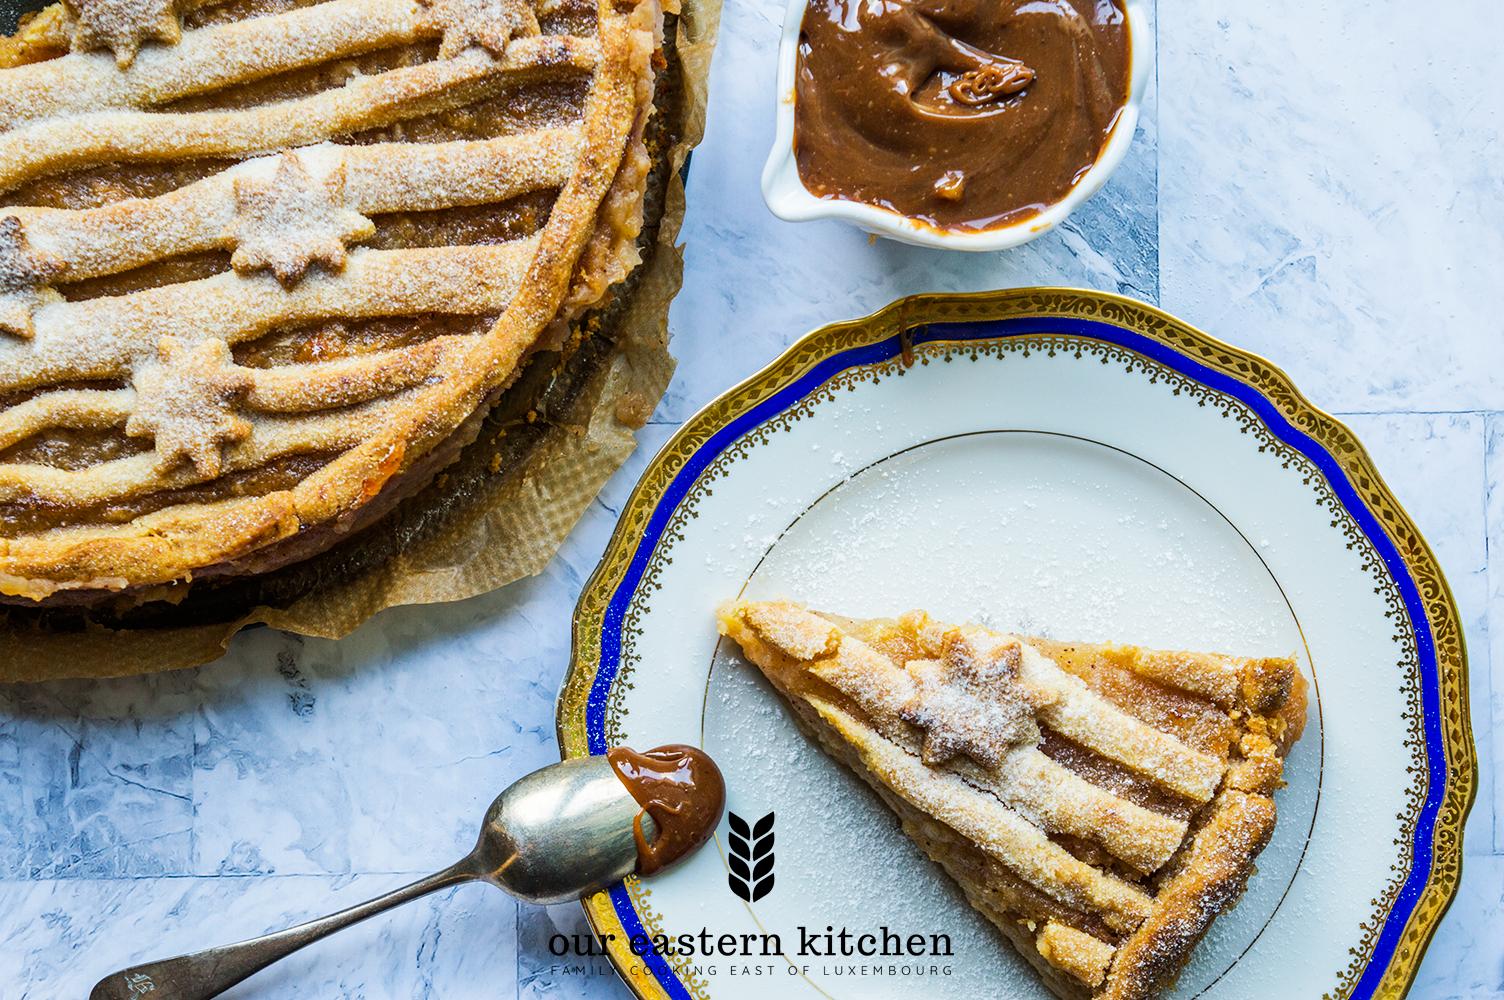 Our_Eastern_Kitchen_Apple_Pie_Banana002